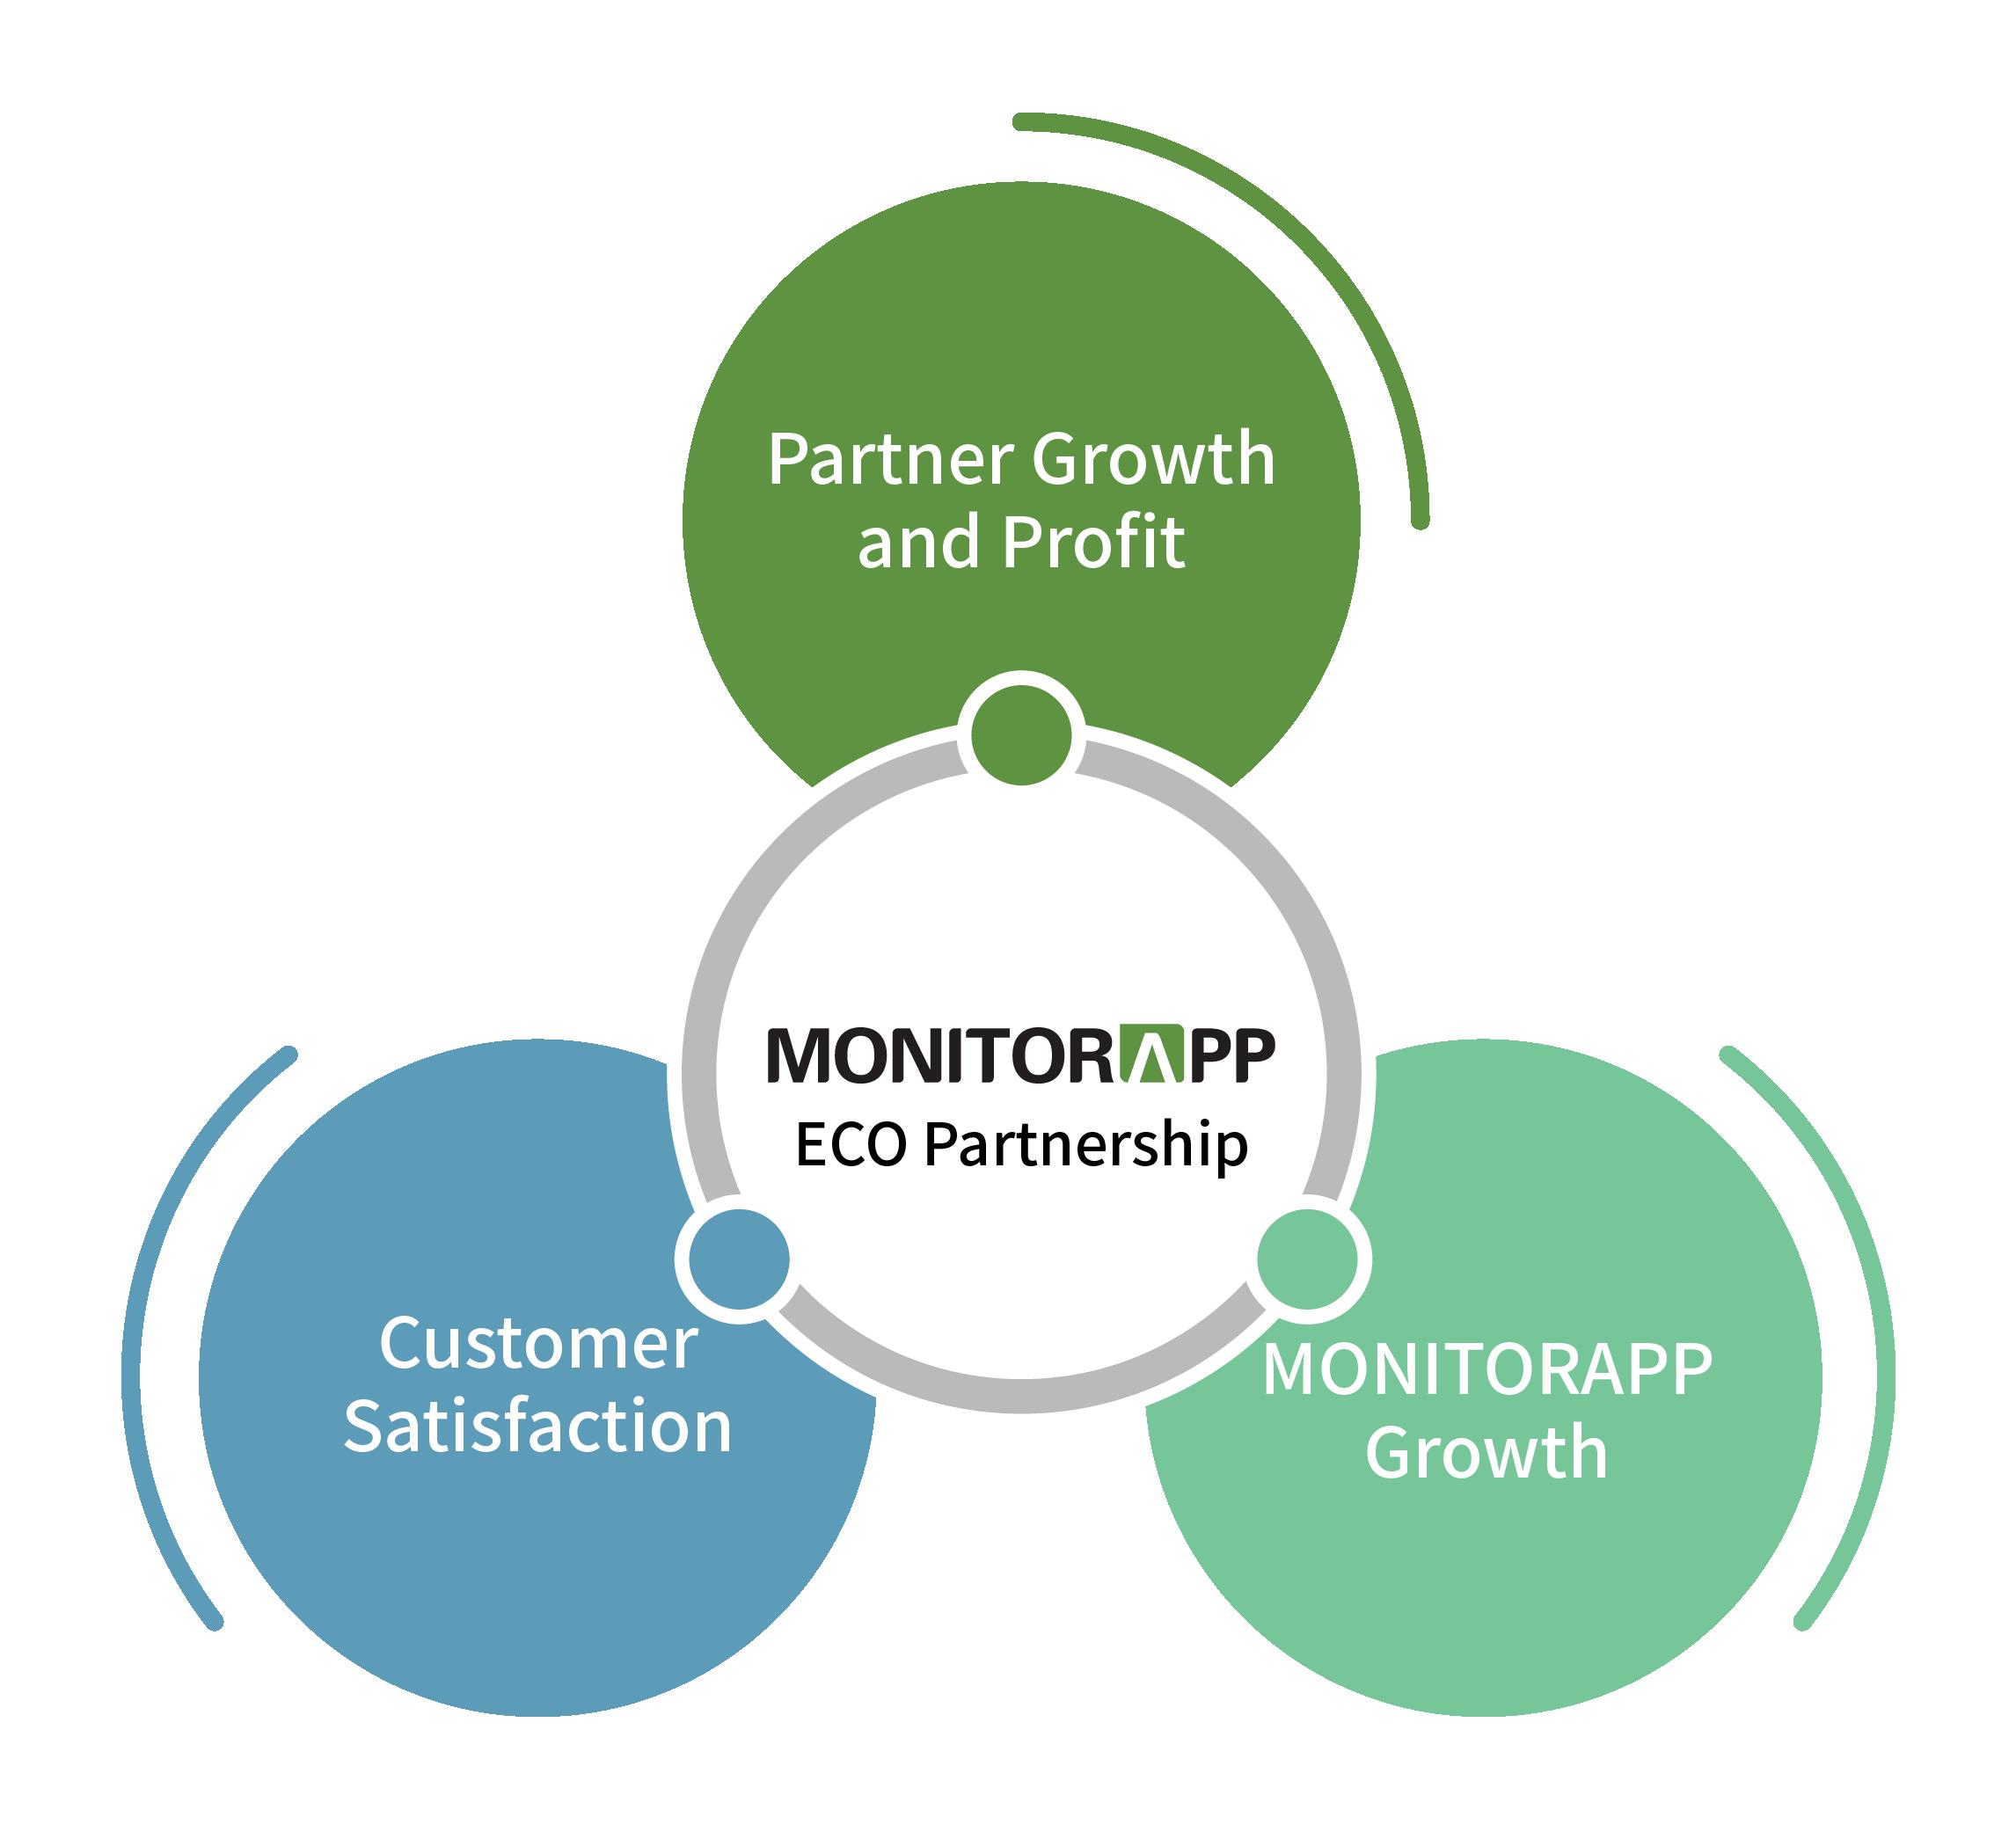 graphic of monitorapp partnership